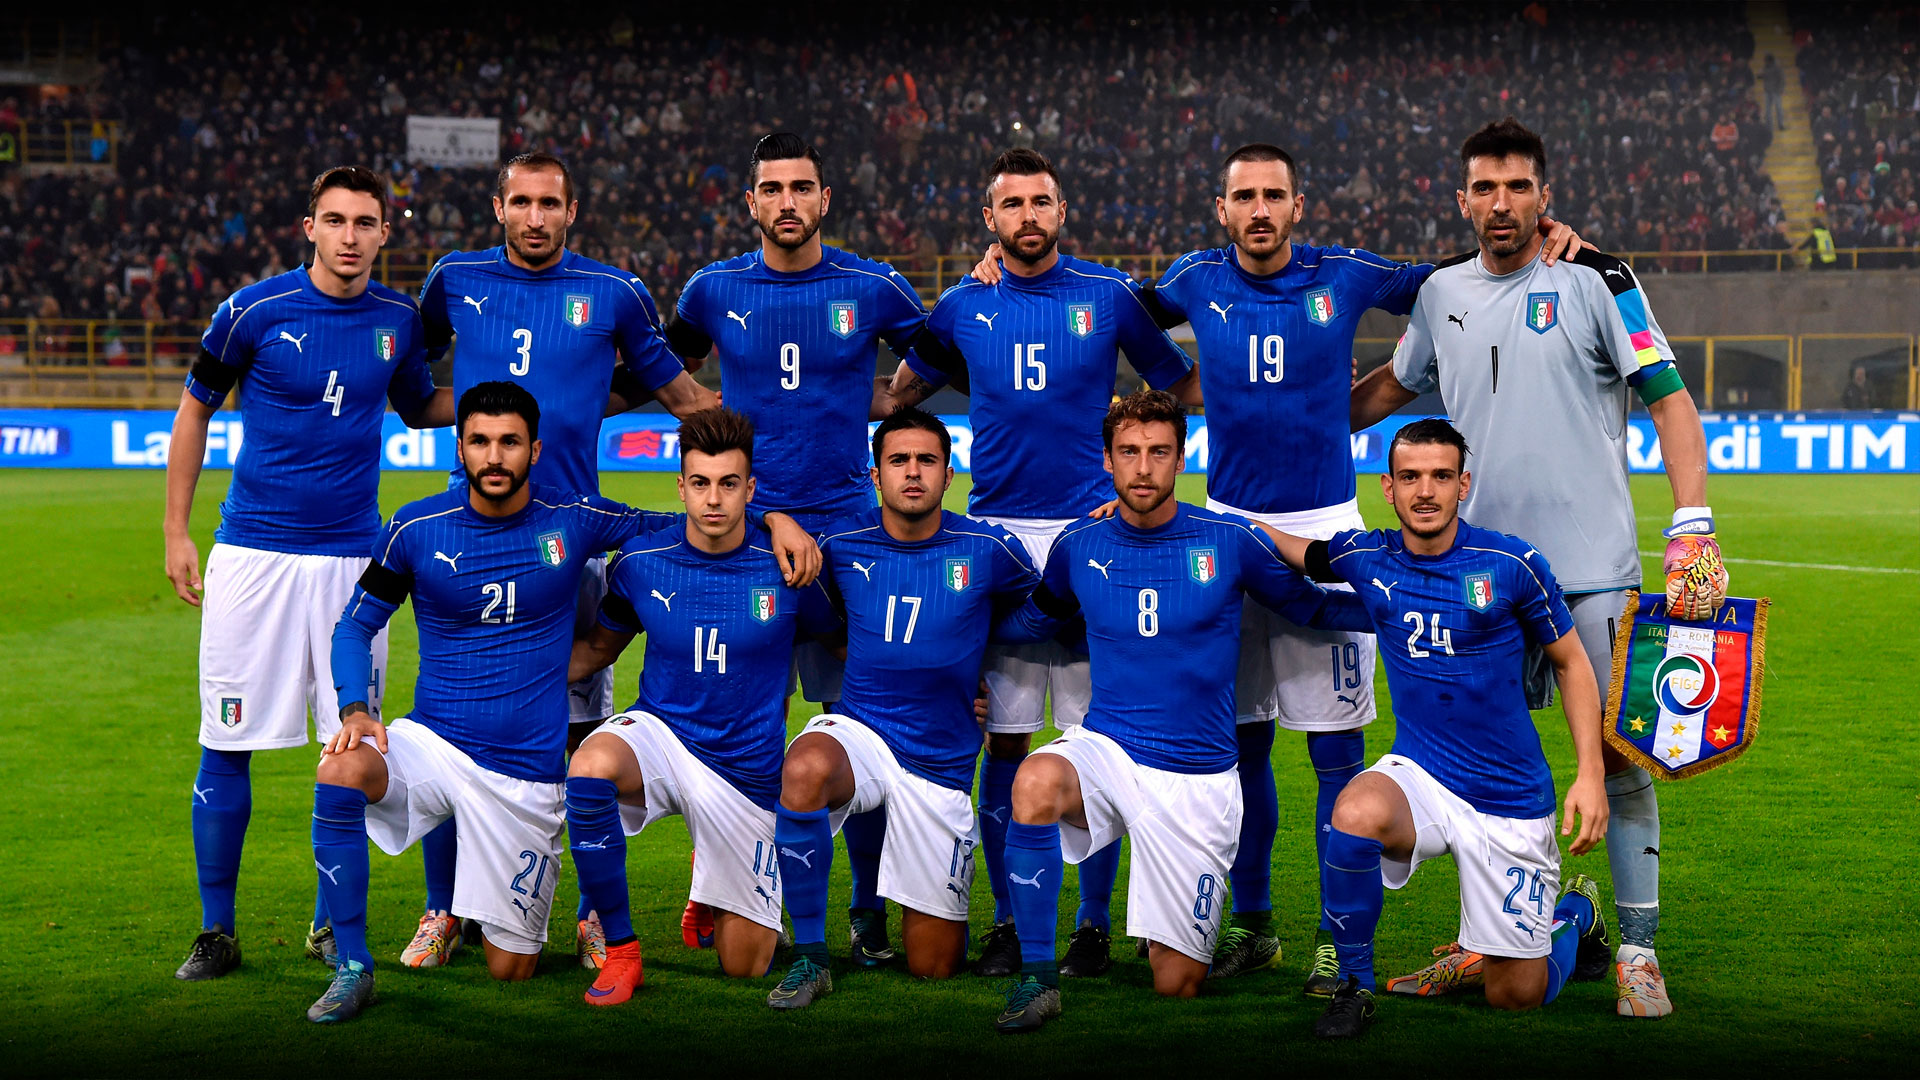 España vs Italia. La selección italiana, próximo rival de la Roja. (Imagen: nexogol.nexofin.com).